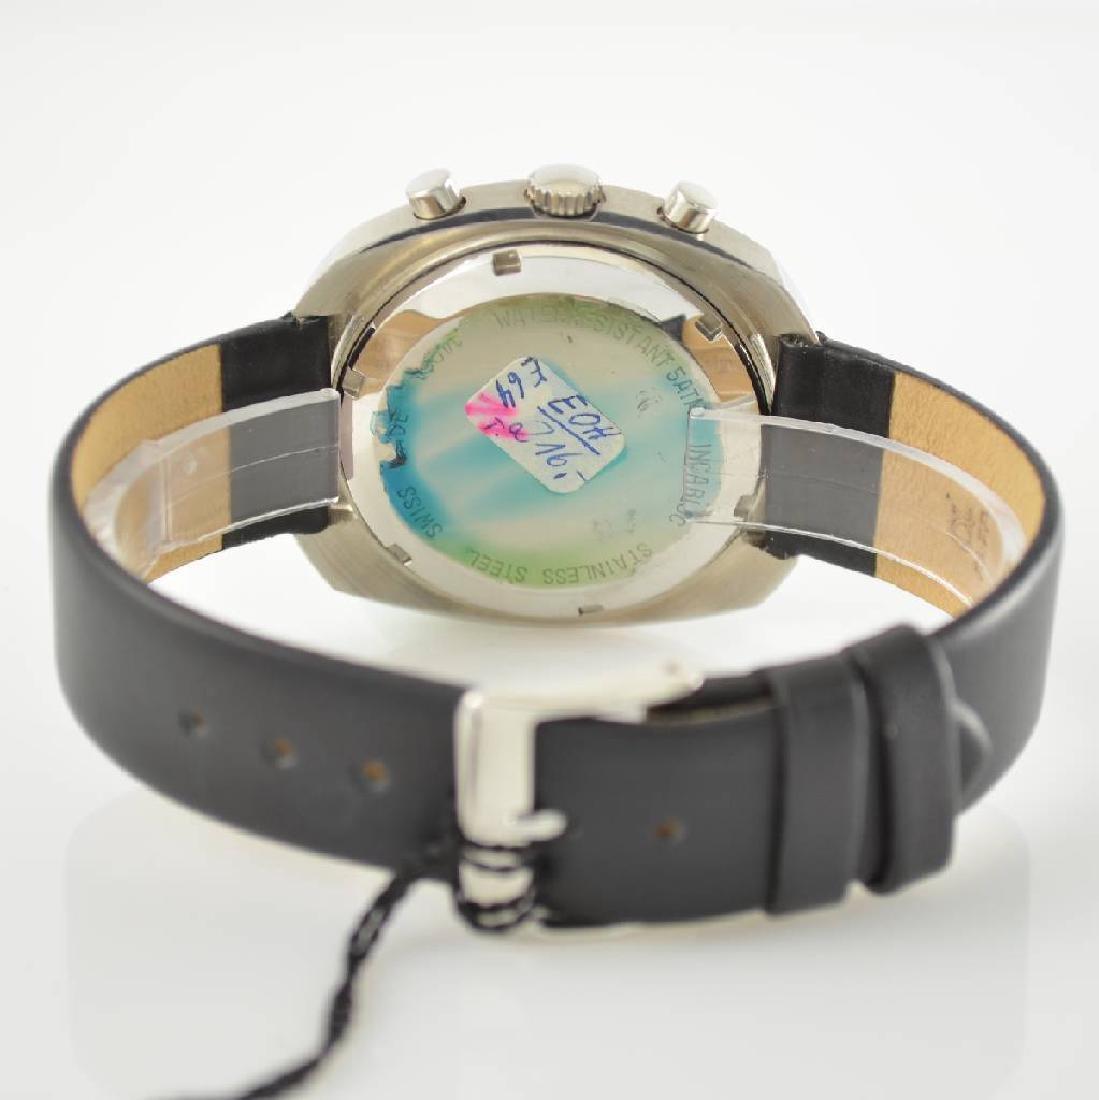 TEWOR unworn gents wristwatch with chronograph - 5